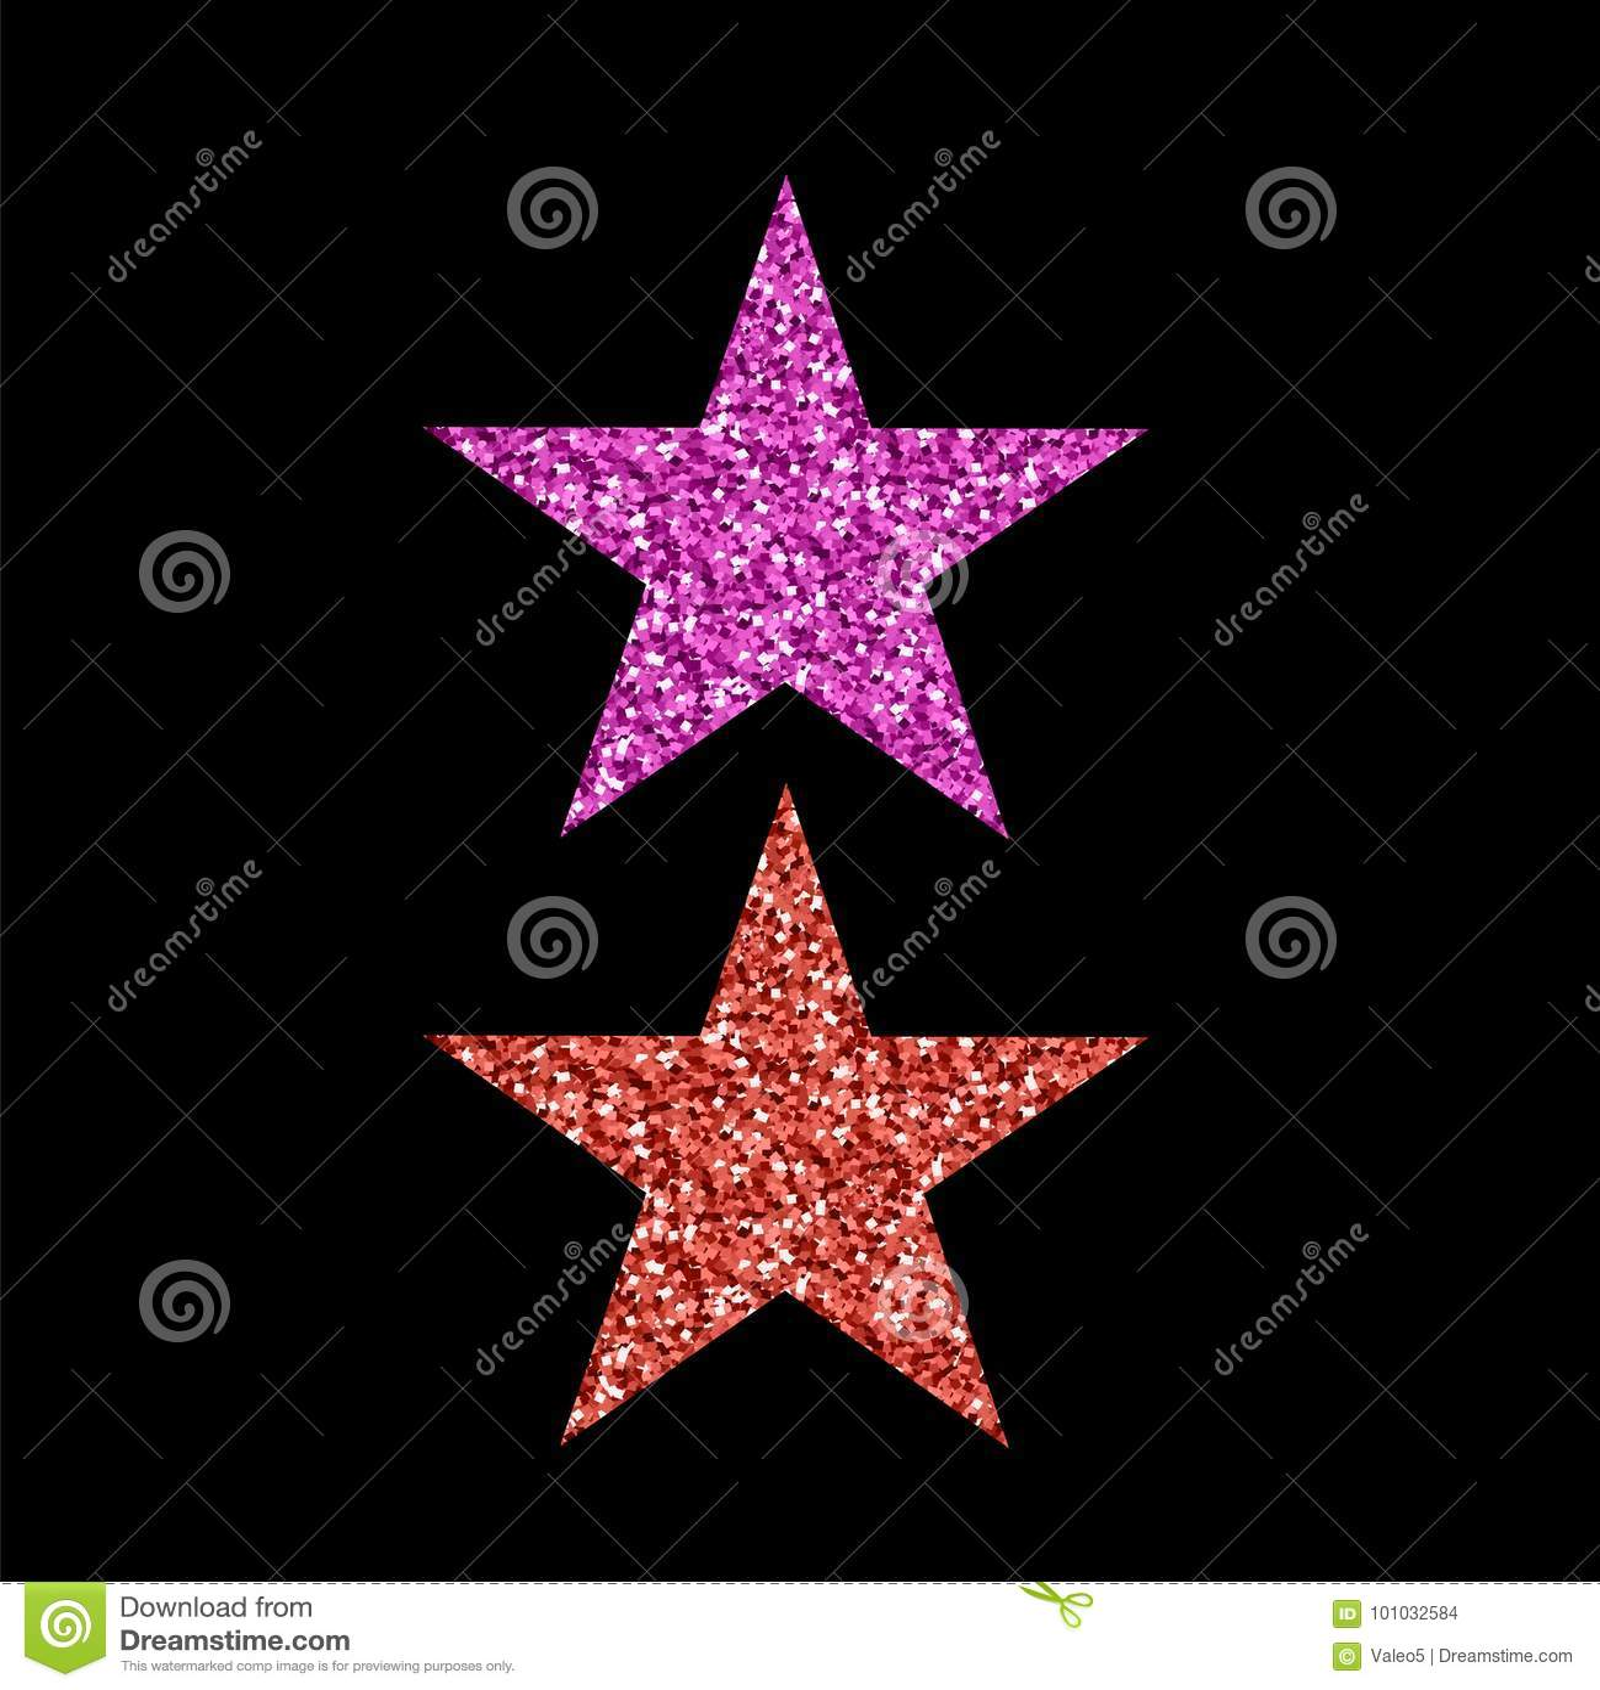 Pink Red Glitter Star